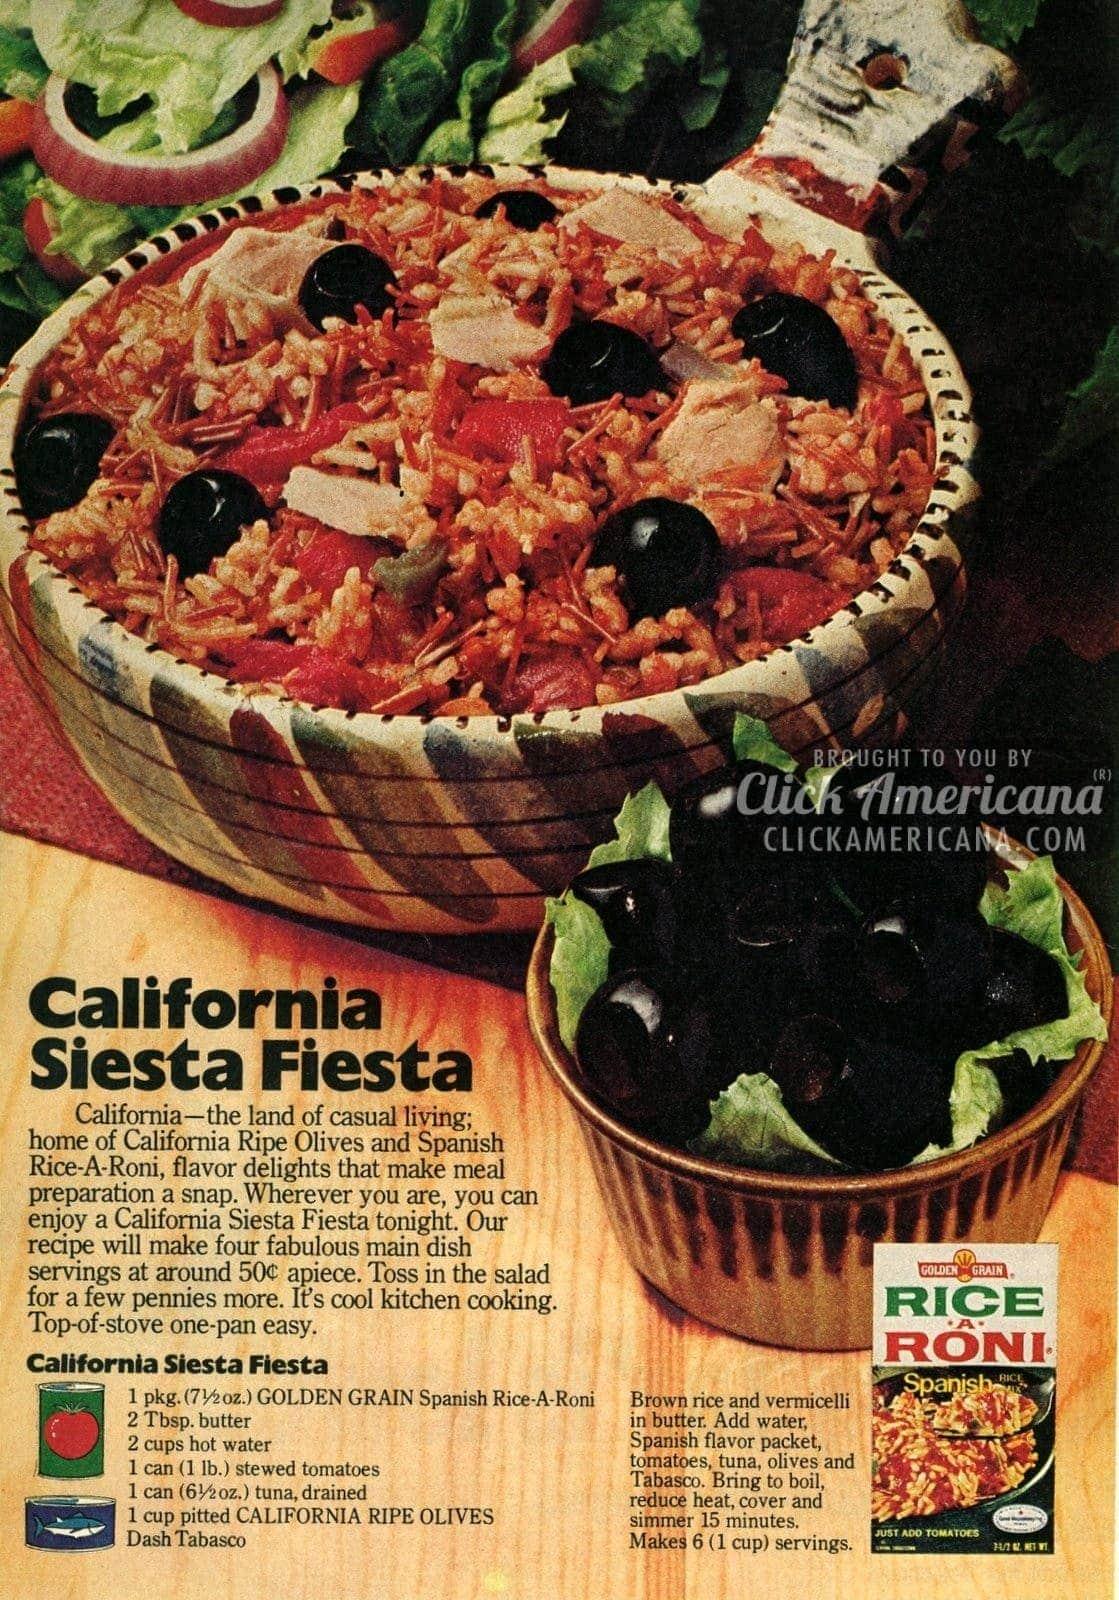 California Siesta Fiesta: Rice with tuna & tomatoes (1976)